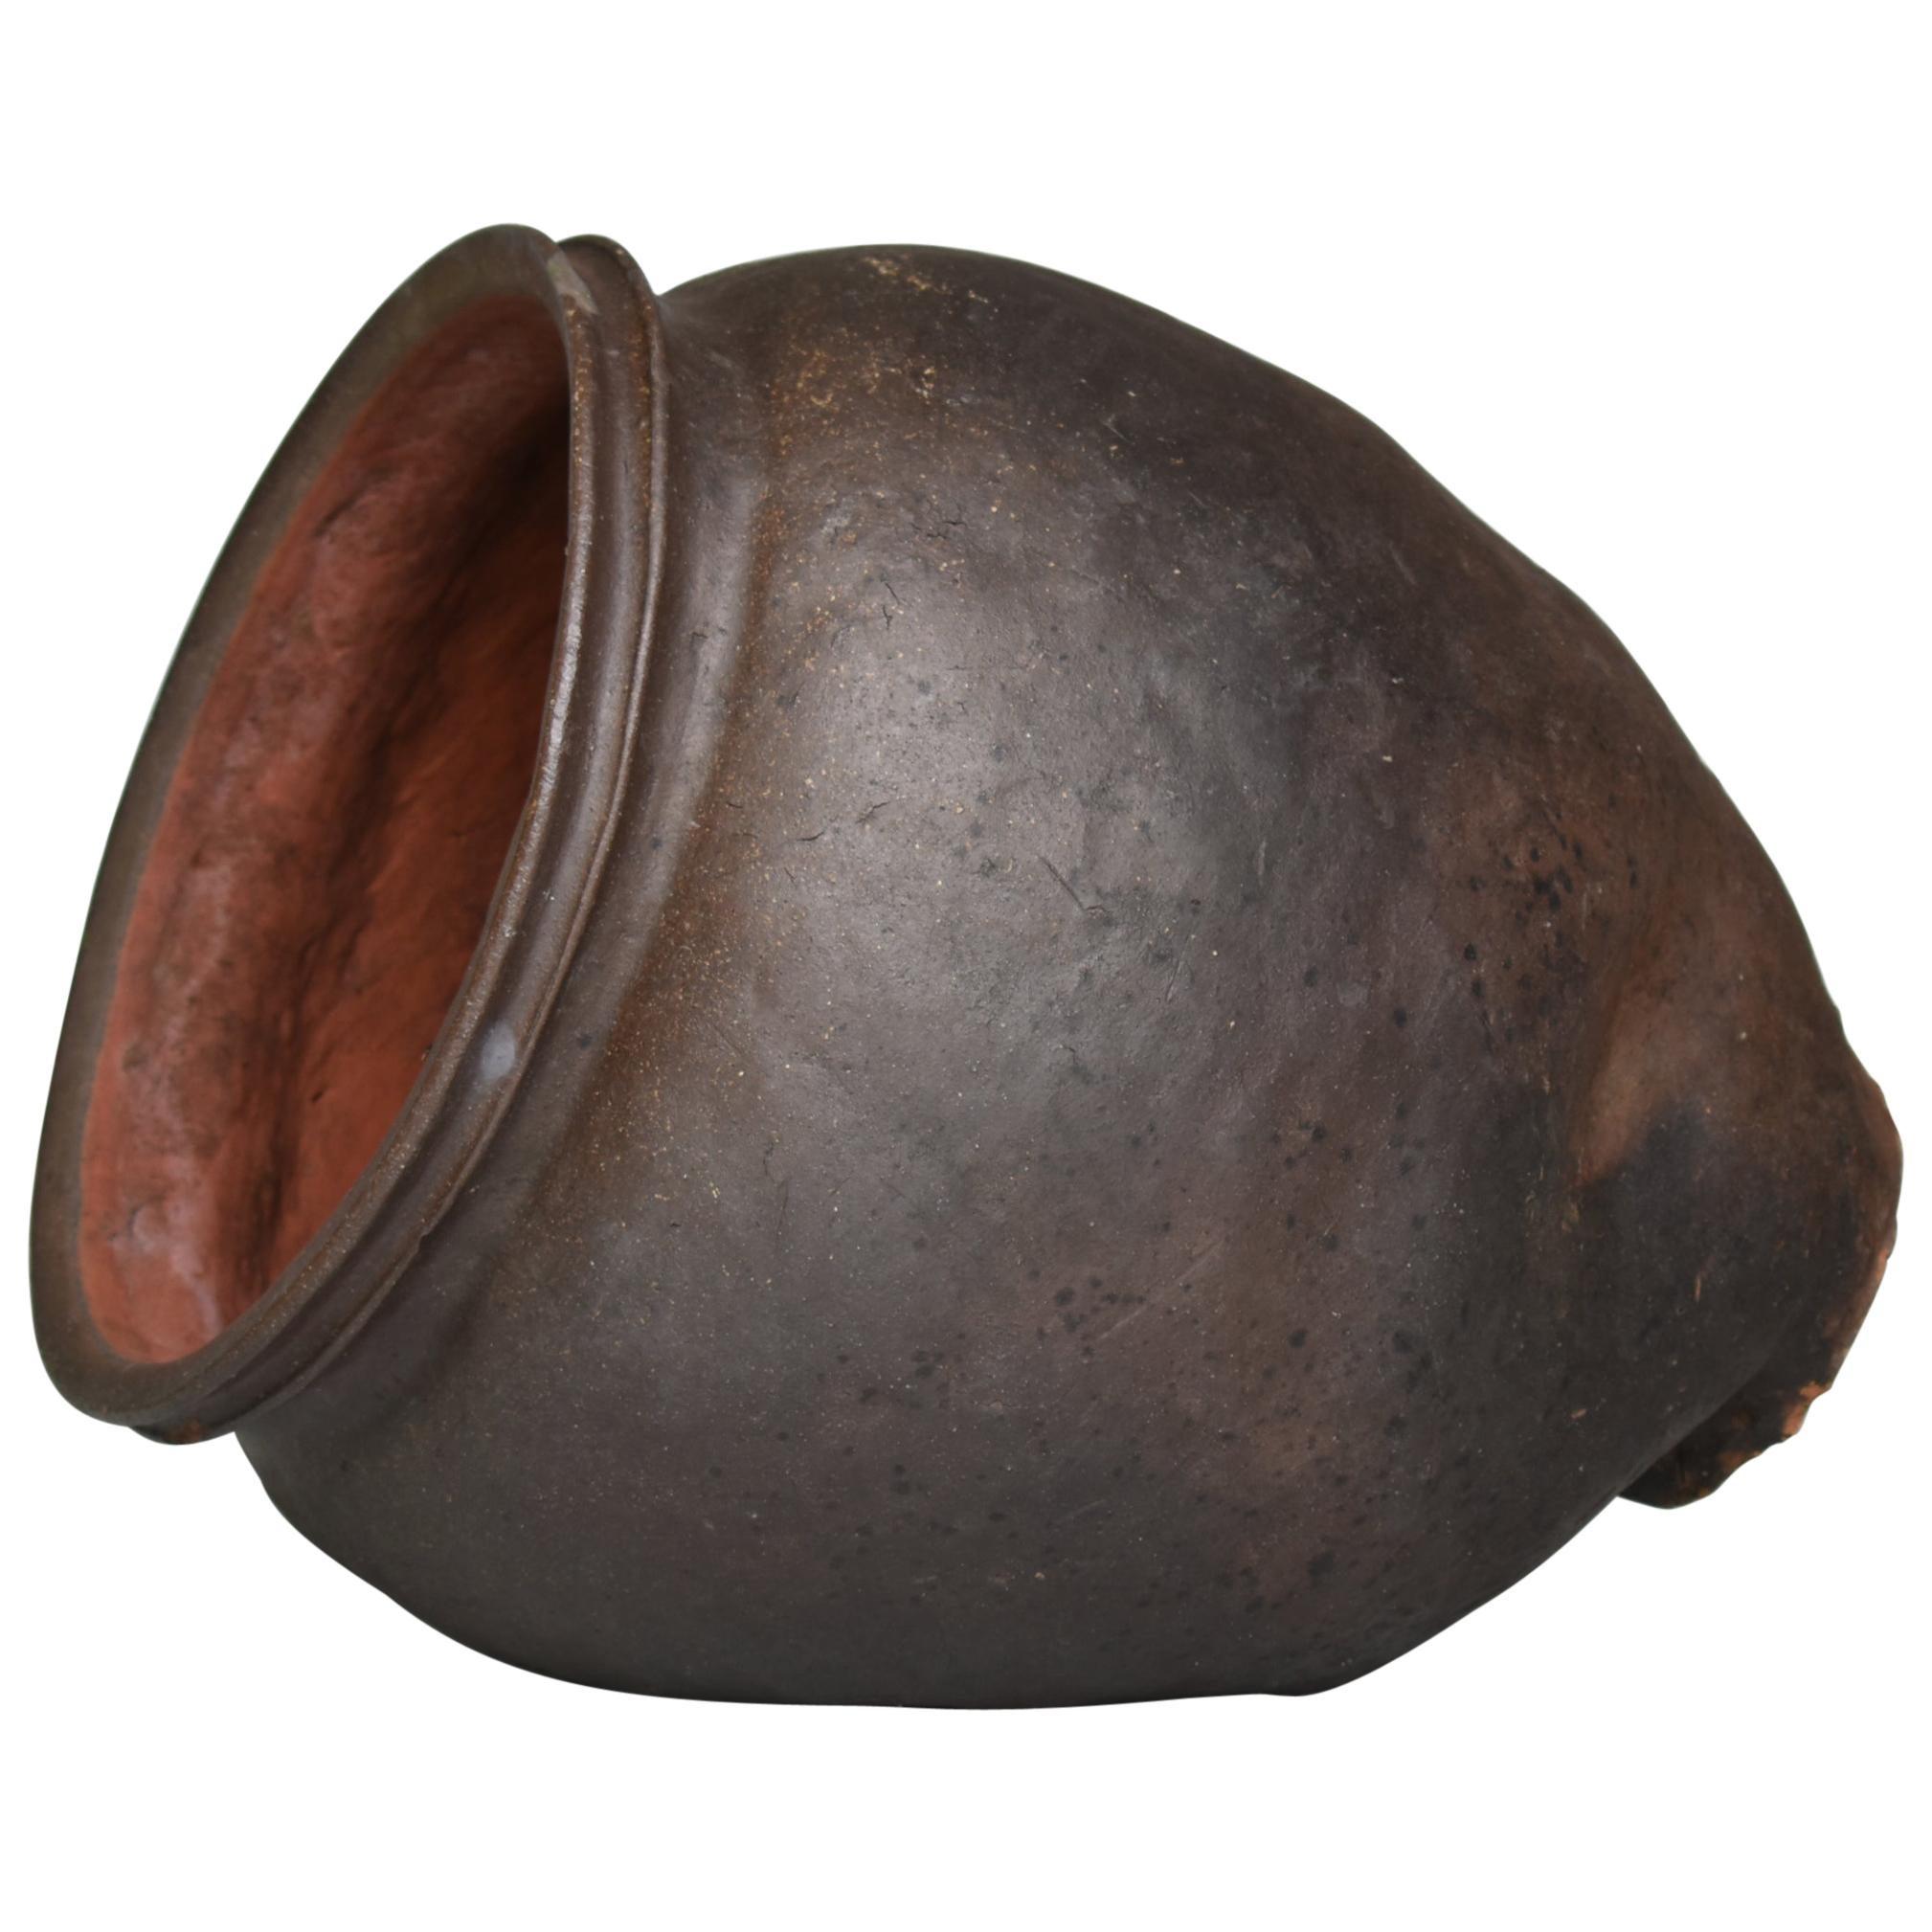 Japanese Old Pottery Tokoname 1700s-1800s/Antique Flower Vase Vessel Jar Ceramic